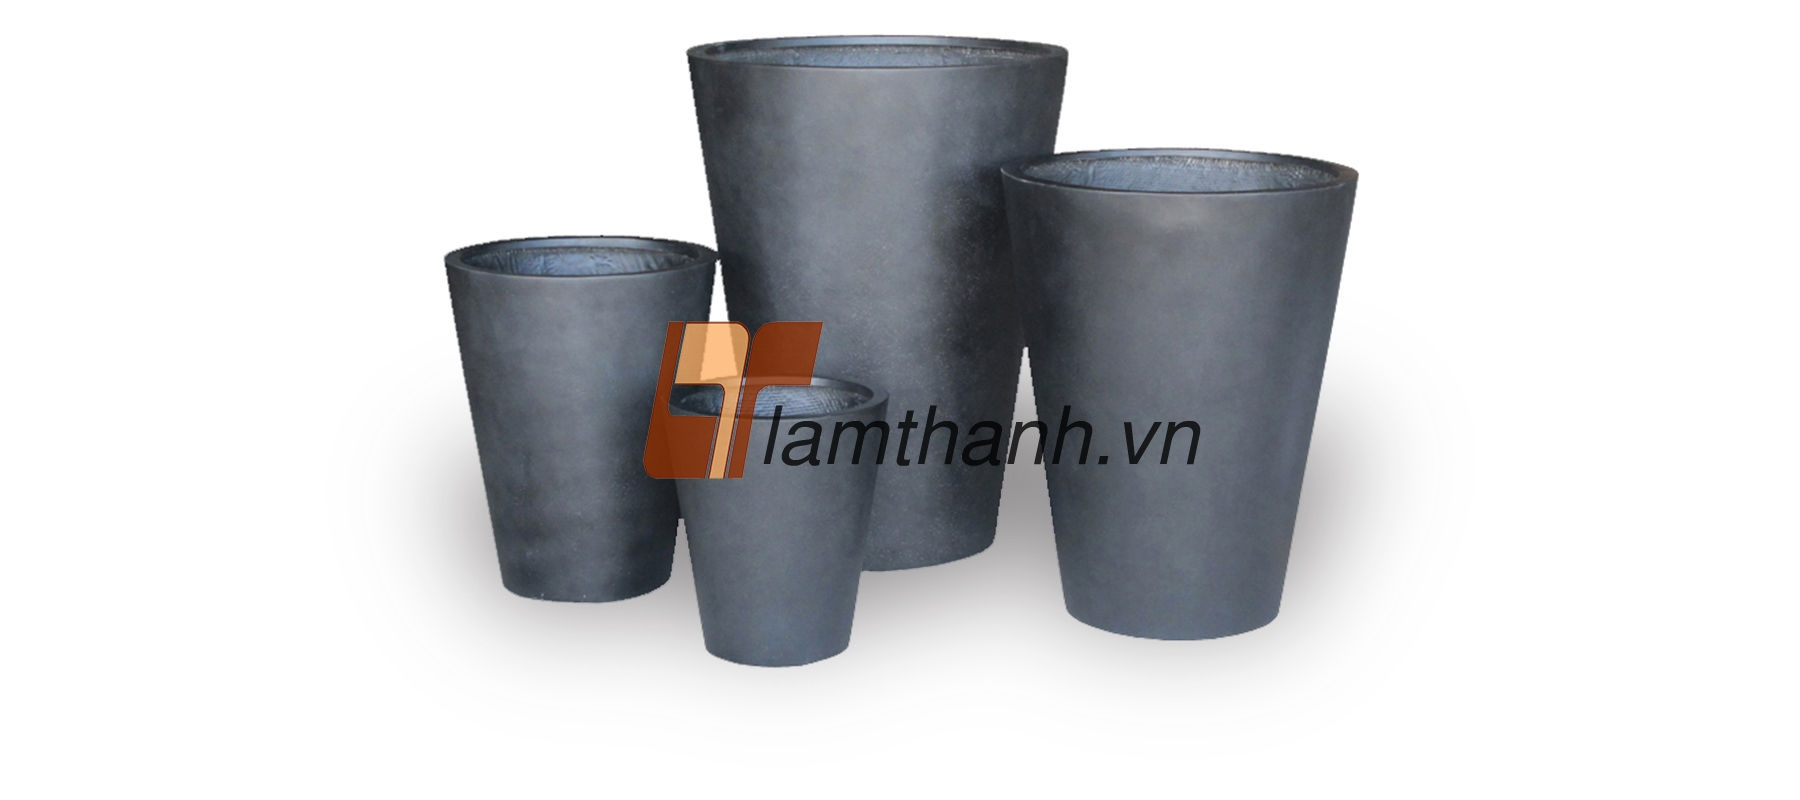 vietnam polystone, fiberstone 02